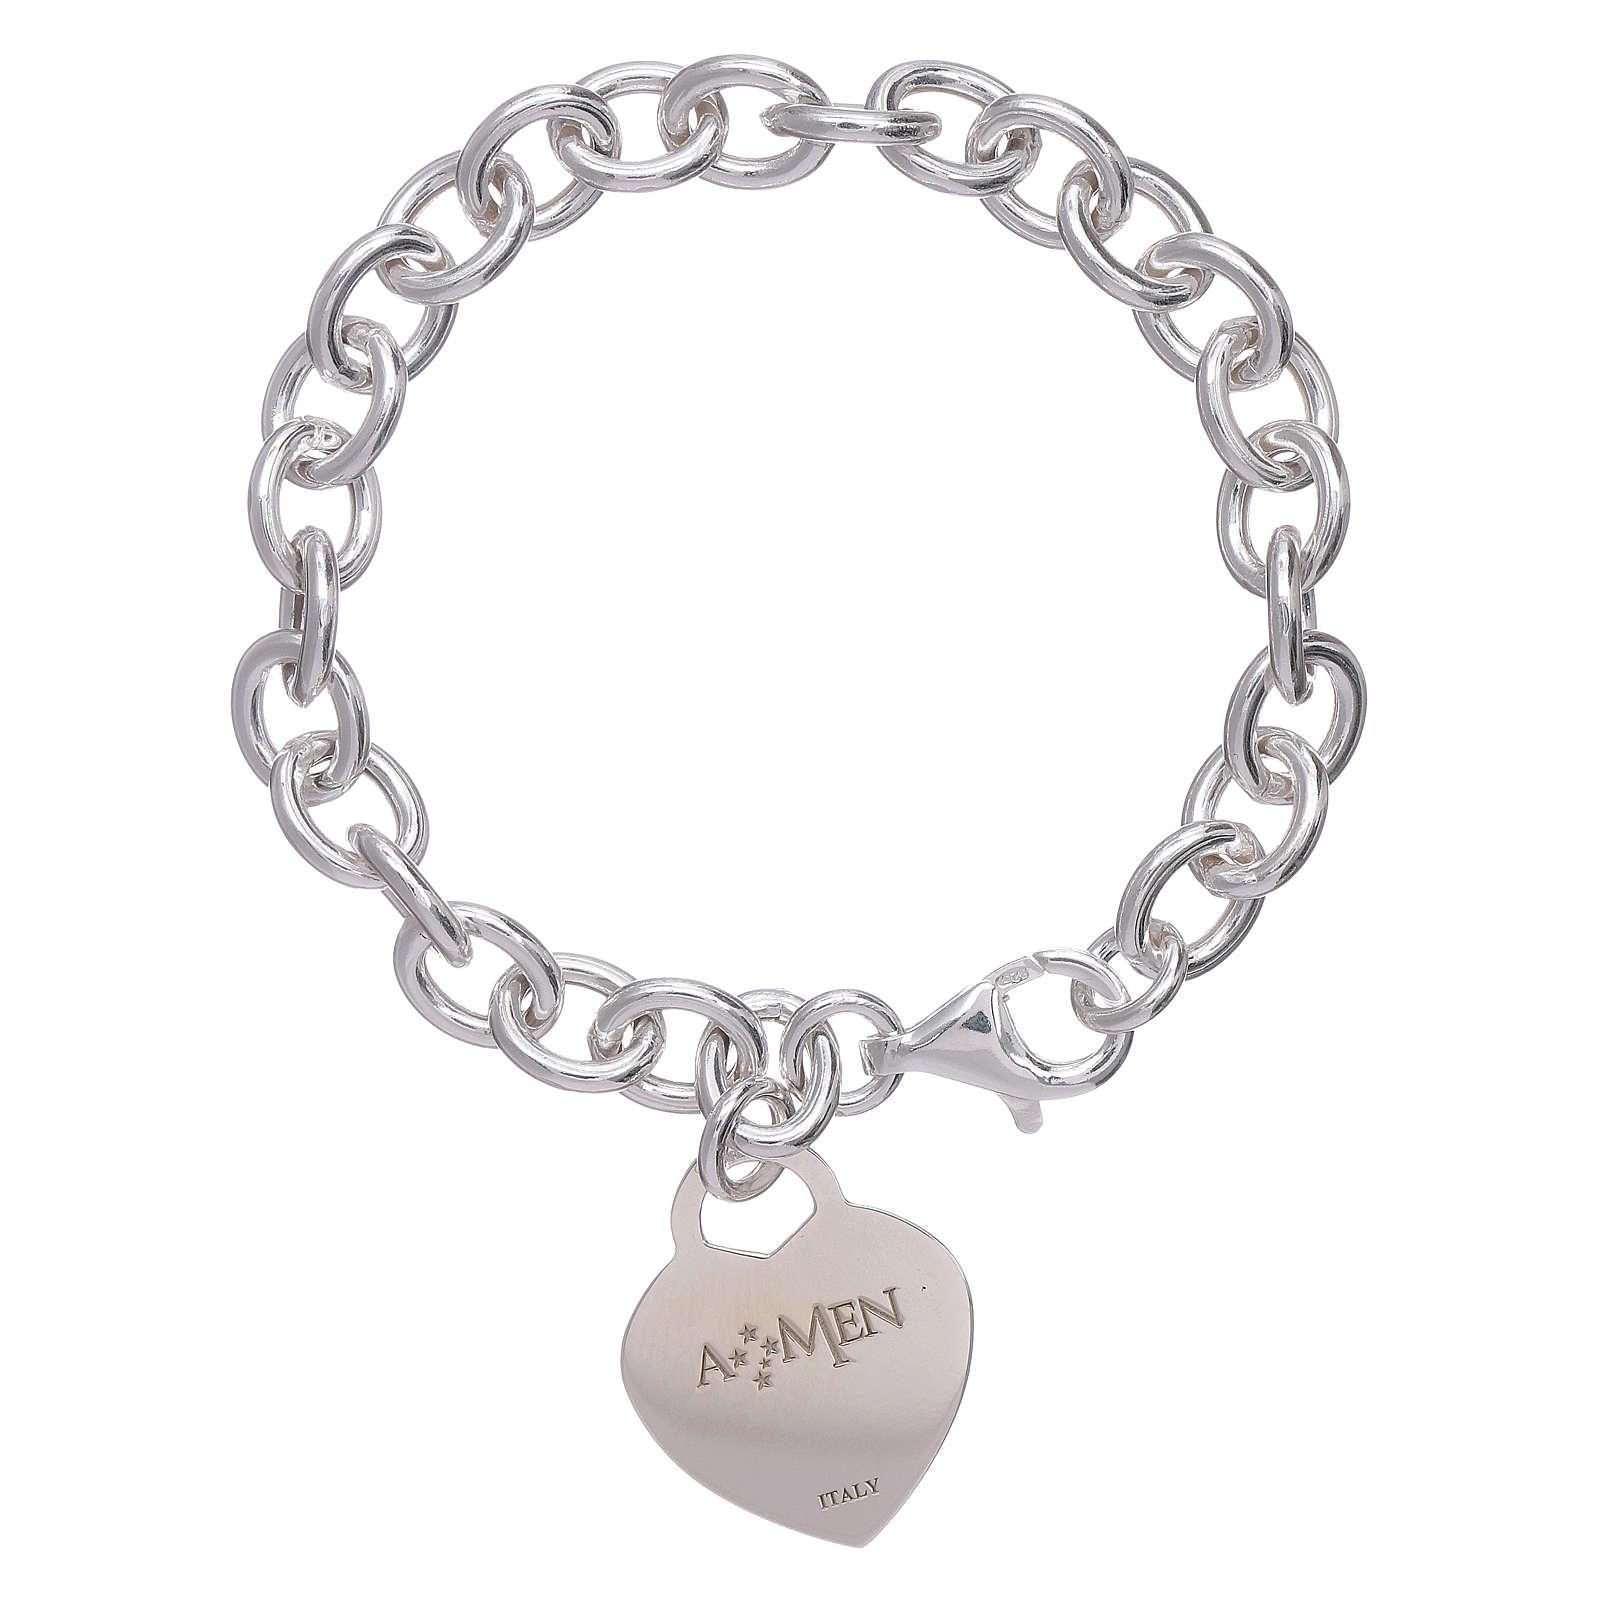 AMEN 925 sterling silver bracelet with a pendant heart 4